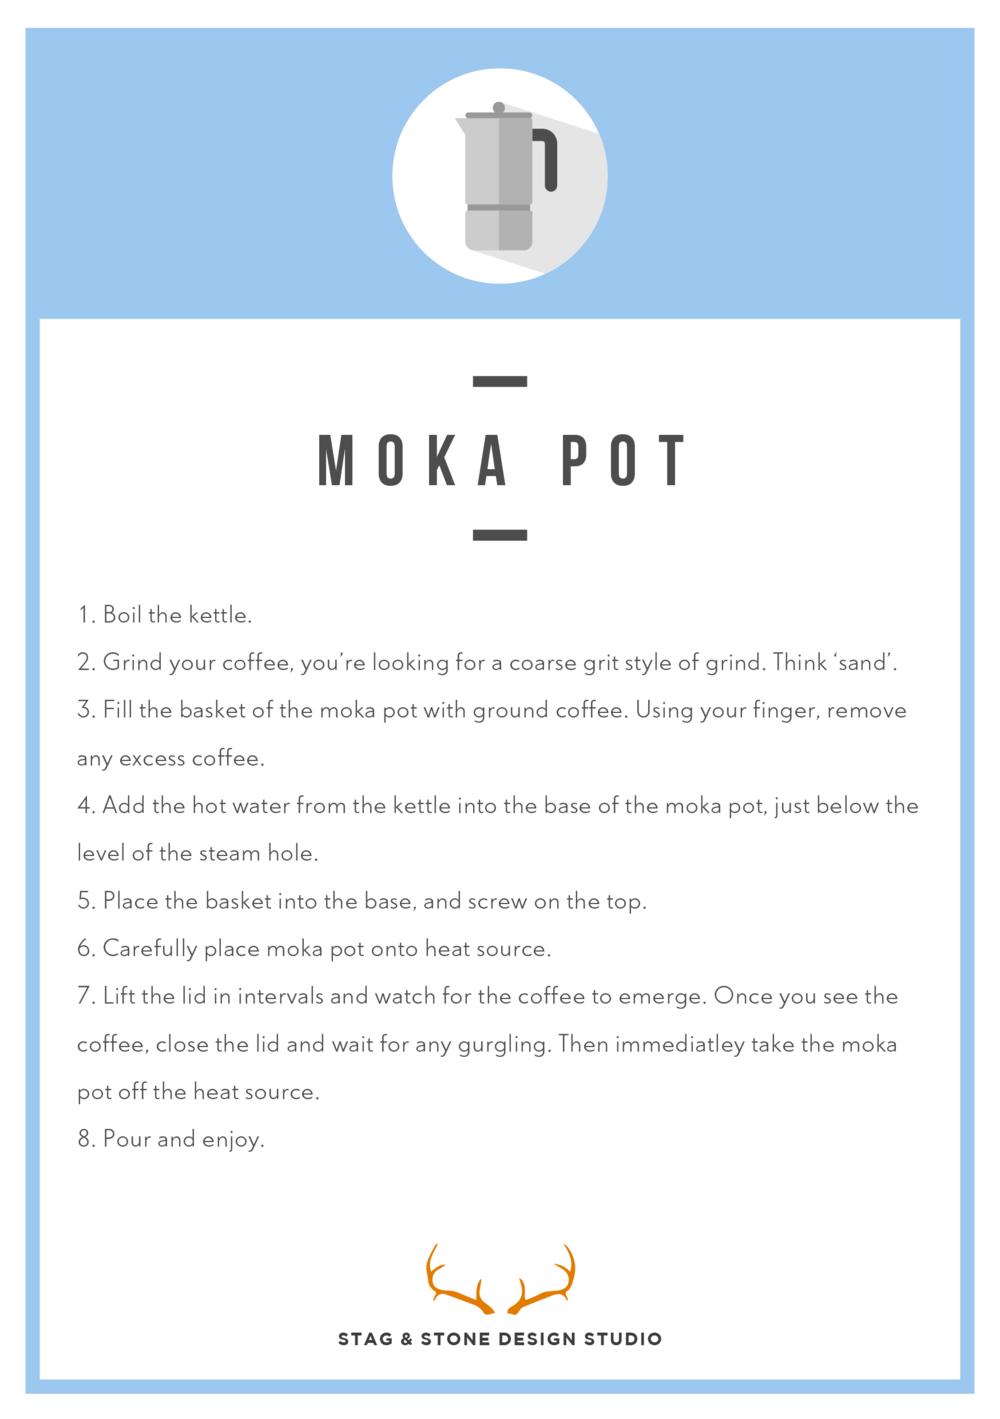 Moka Pot Instructions